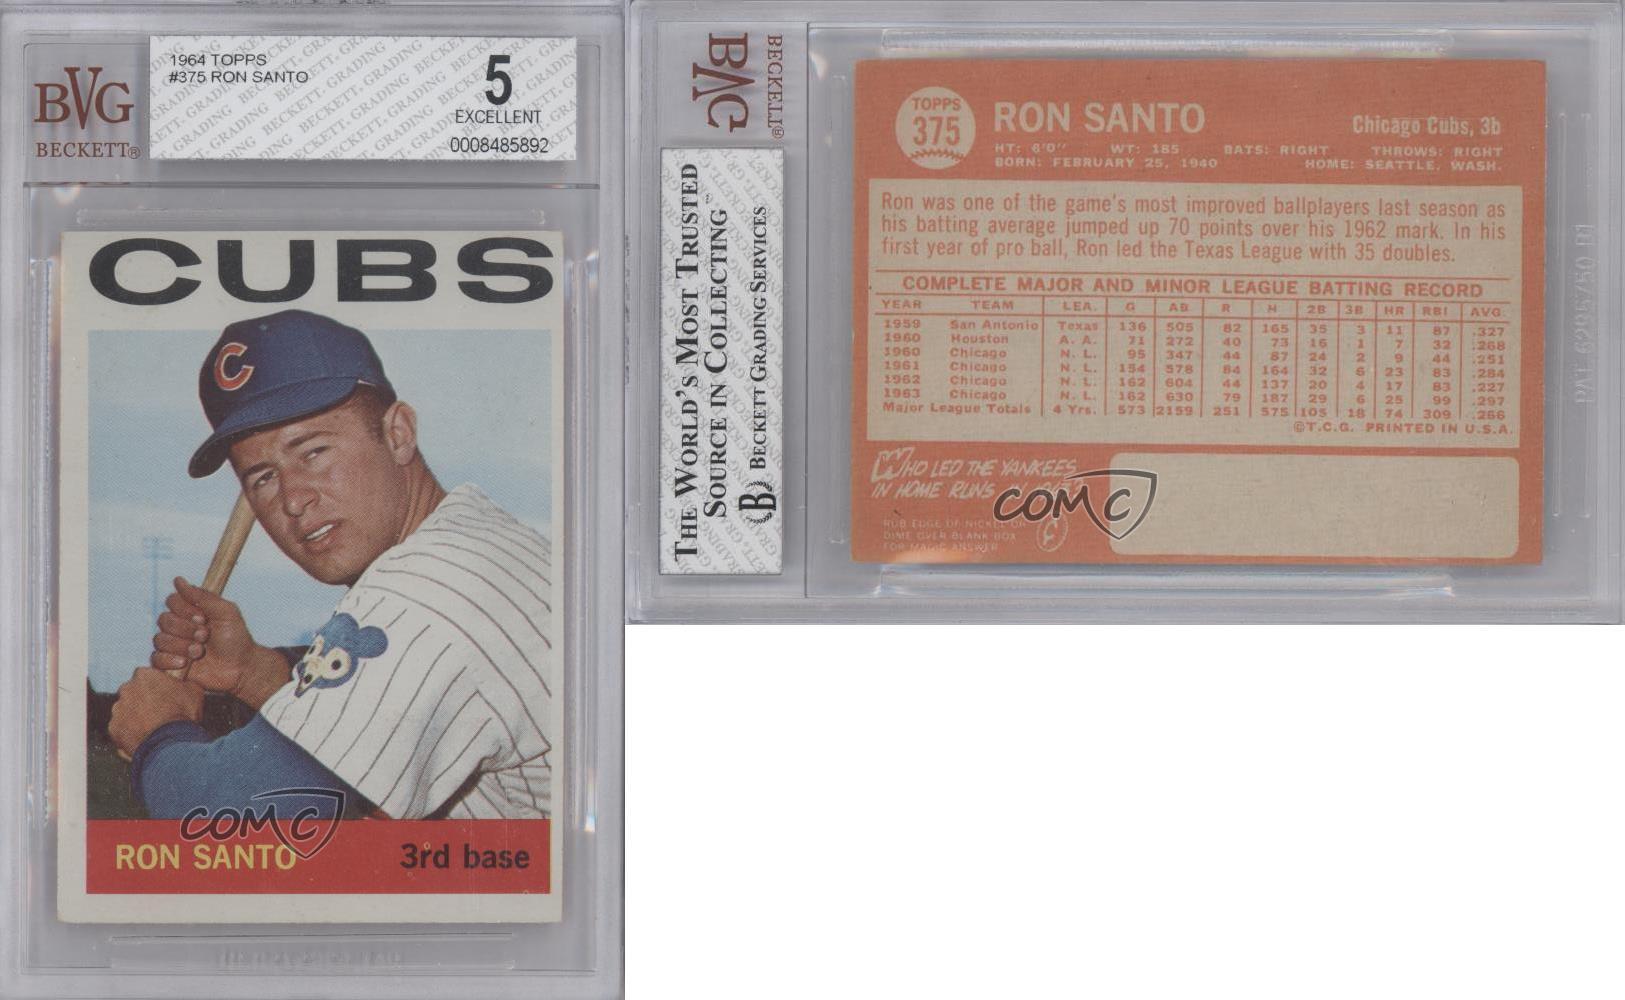 1964 topps 375 ron santo bvg 5 chicago cubs baseball card ebay. Black Bedroom Furniture Sets. Home Design Ideas